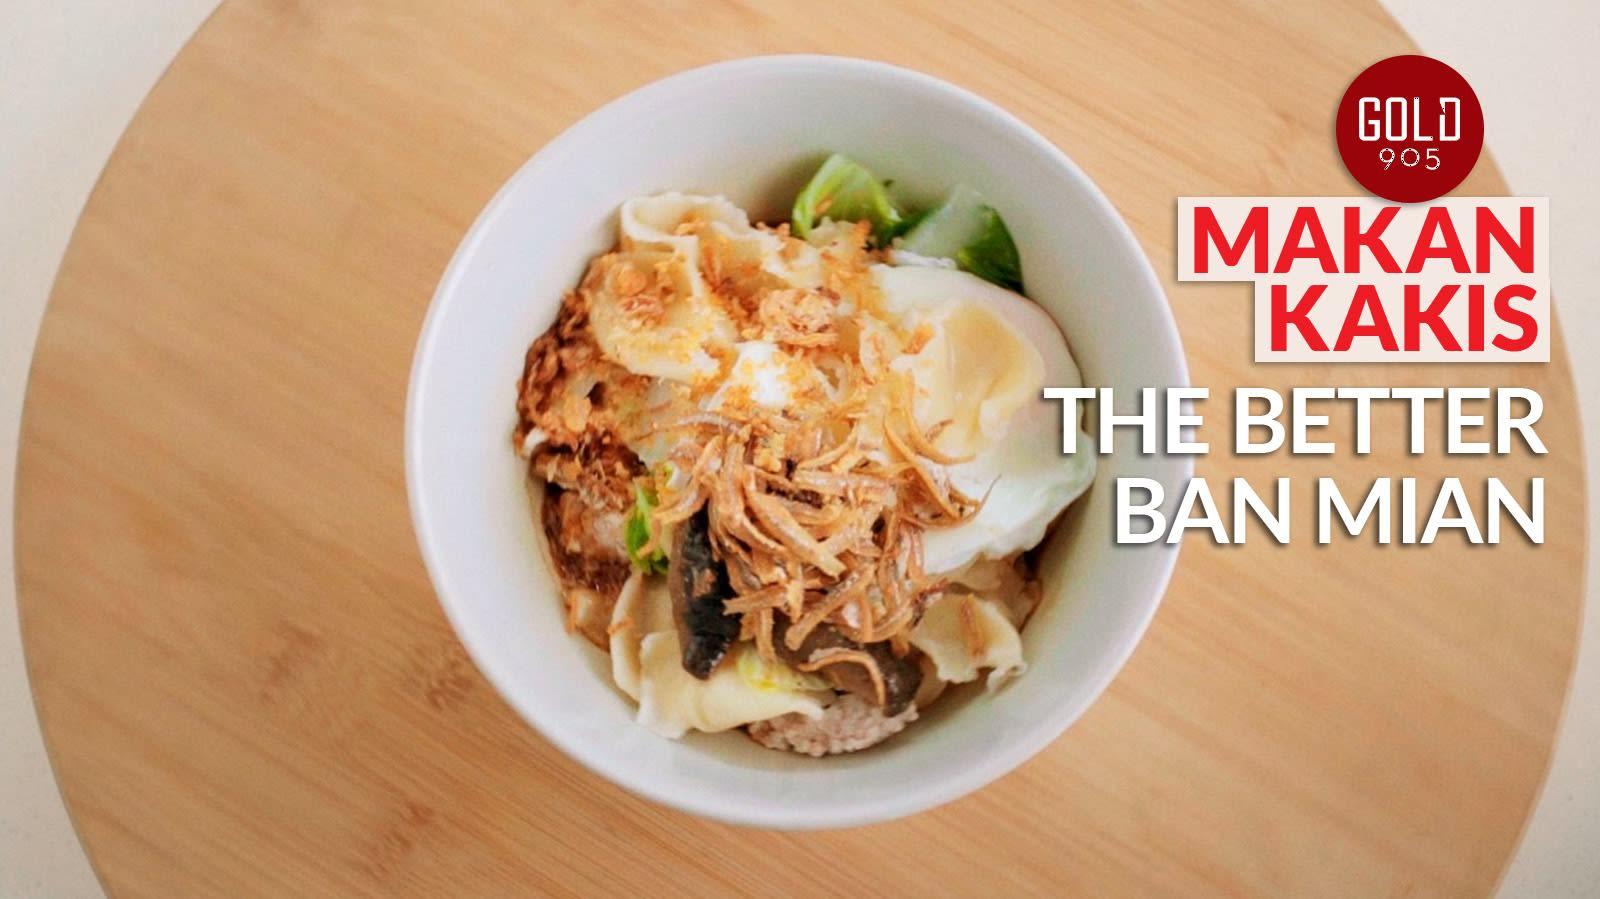 Makan Kakis: Grandma's ban mian with grandson's Italian twist | CNA Lifestyle